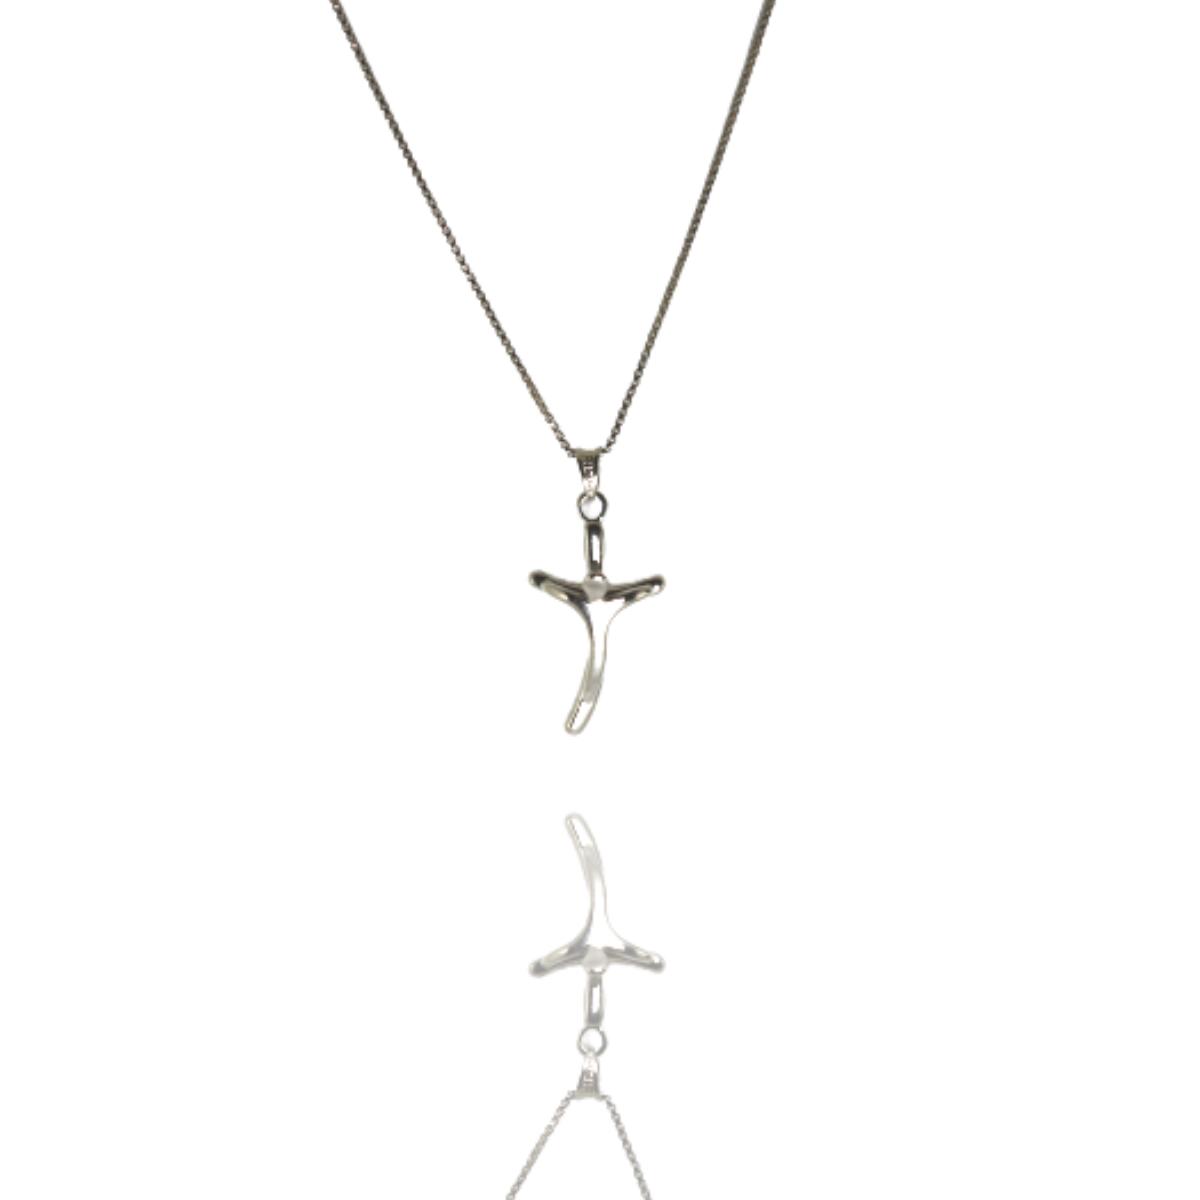 Colar Barbara Strauss Semi Joia Crucifixo Em Metal, Revestido Em Ouro Branco 18K